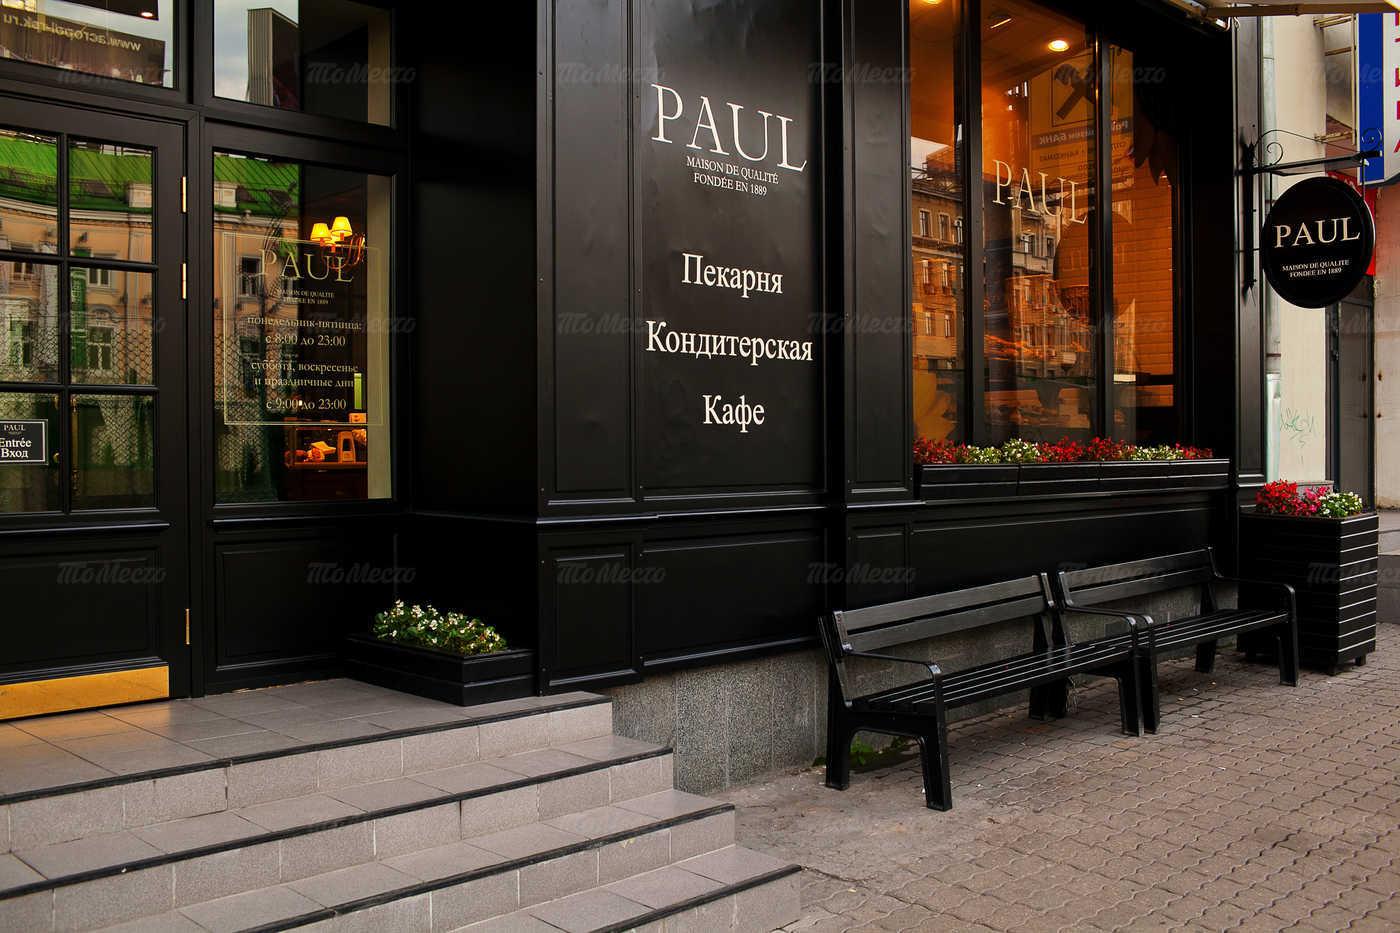 Меню кафе Paul на улице Арбат